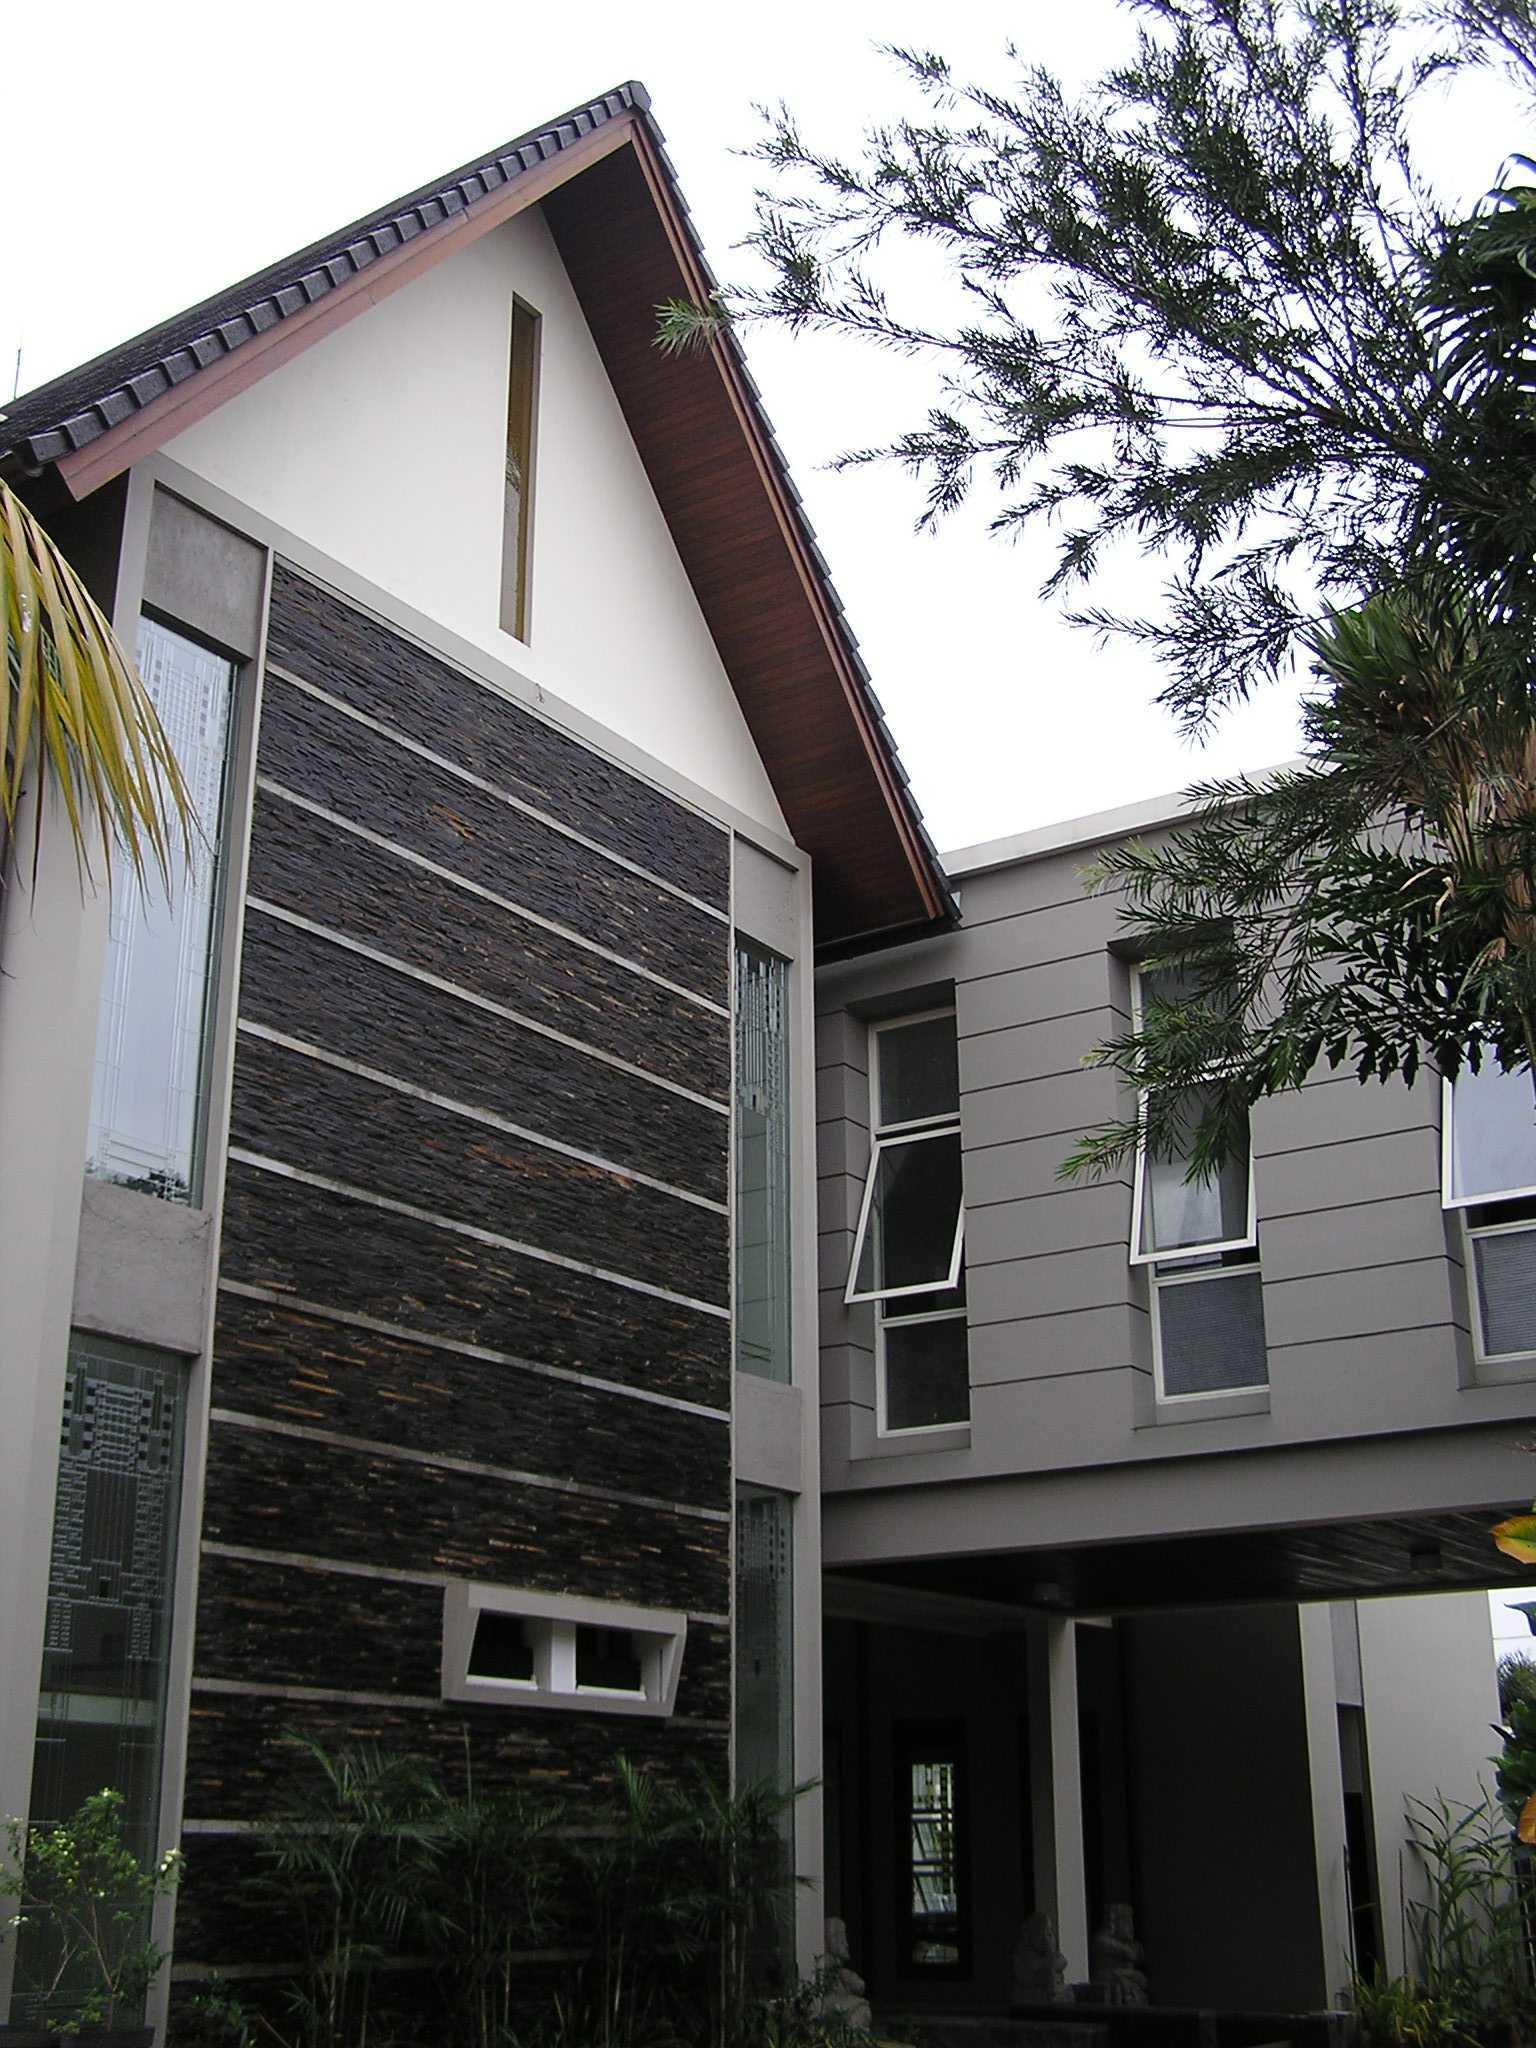 Pt. Garisprada Tomang Residence Tomang, Grogol Petamburan, West Jakarta City, Jakarta, Indonesia Tomang Exterior Modern  22238